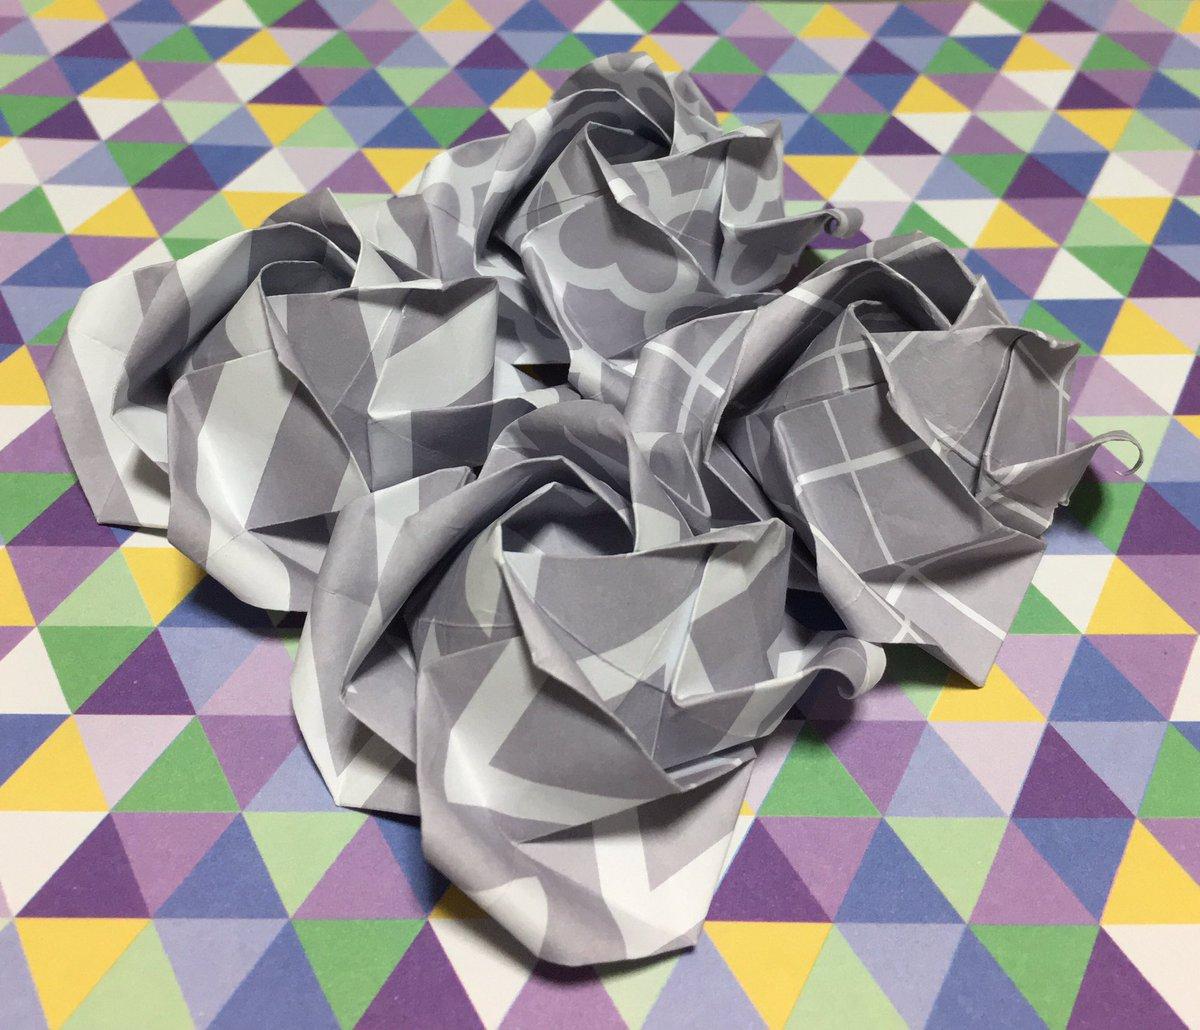 test ツイッターメディア - セリアでディーンさんのロゼットを作ろうと材料を購入しに行ったら面白い折り紙を見つけたのでバラの花を折って見ました何個折ったか解りますか#ディーンフジオカ #セリア https://t.co/OPV8EqYALF